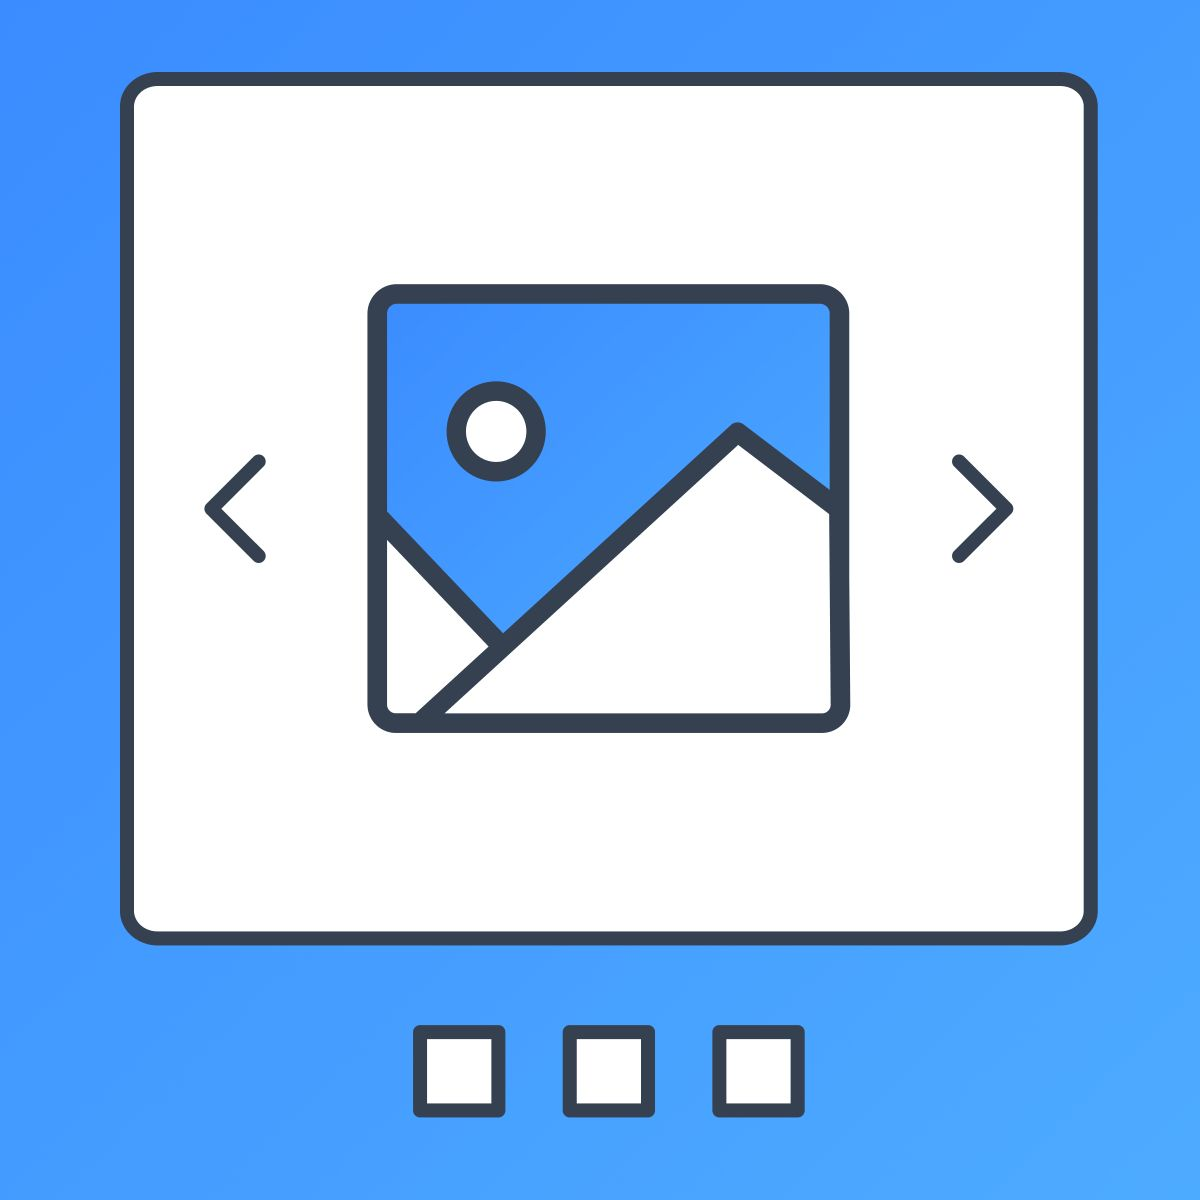 Shopify Image optimizer app by Powr.io